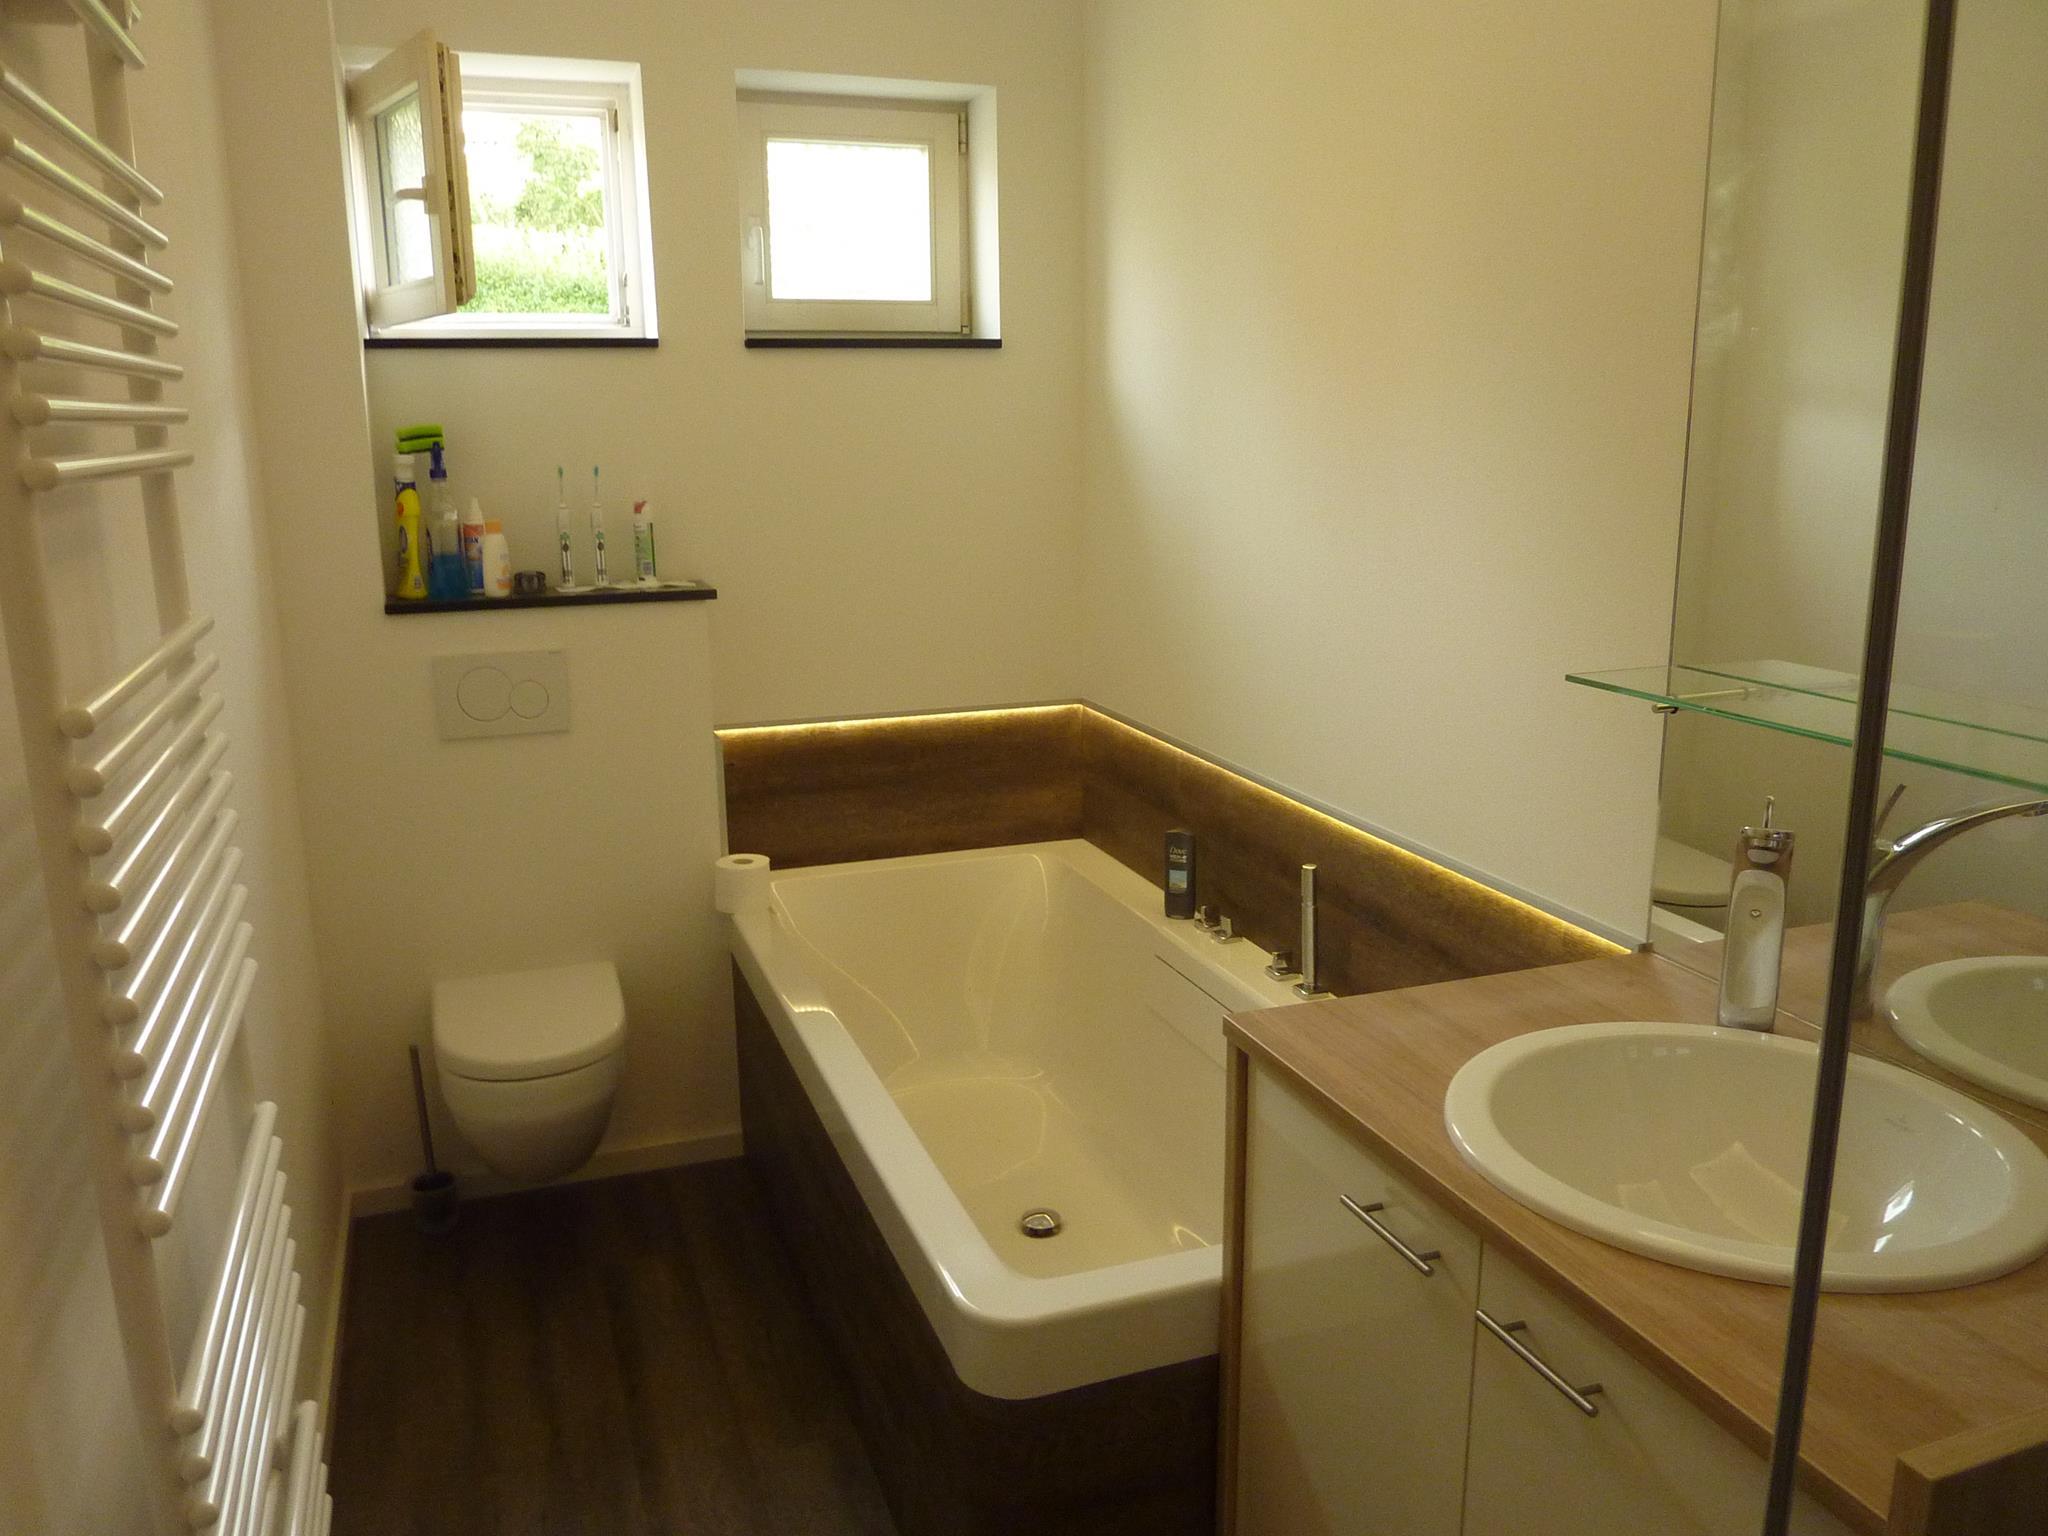 bad ohne fliesen best bodenbelag bad keine fliesen deko ideen berall bodenbelag bad keine. Black Bedroom Furniture Sets. Home Design Ideas